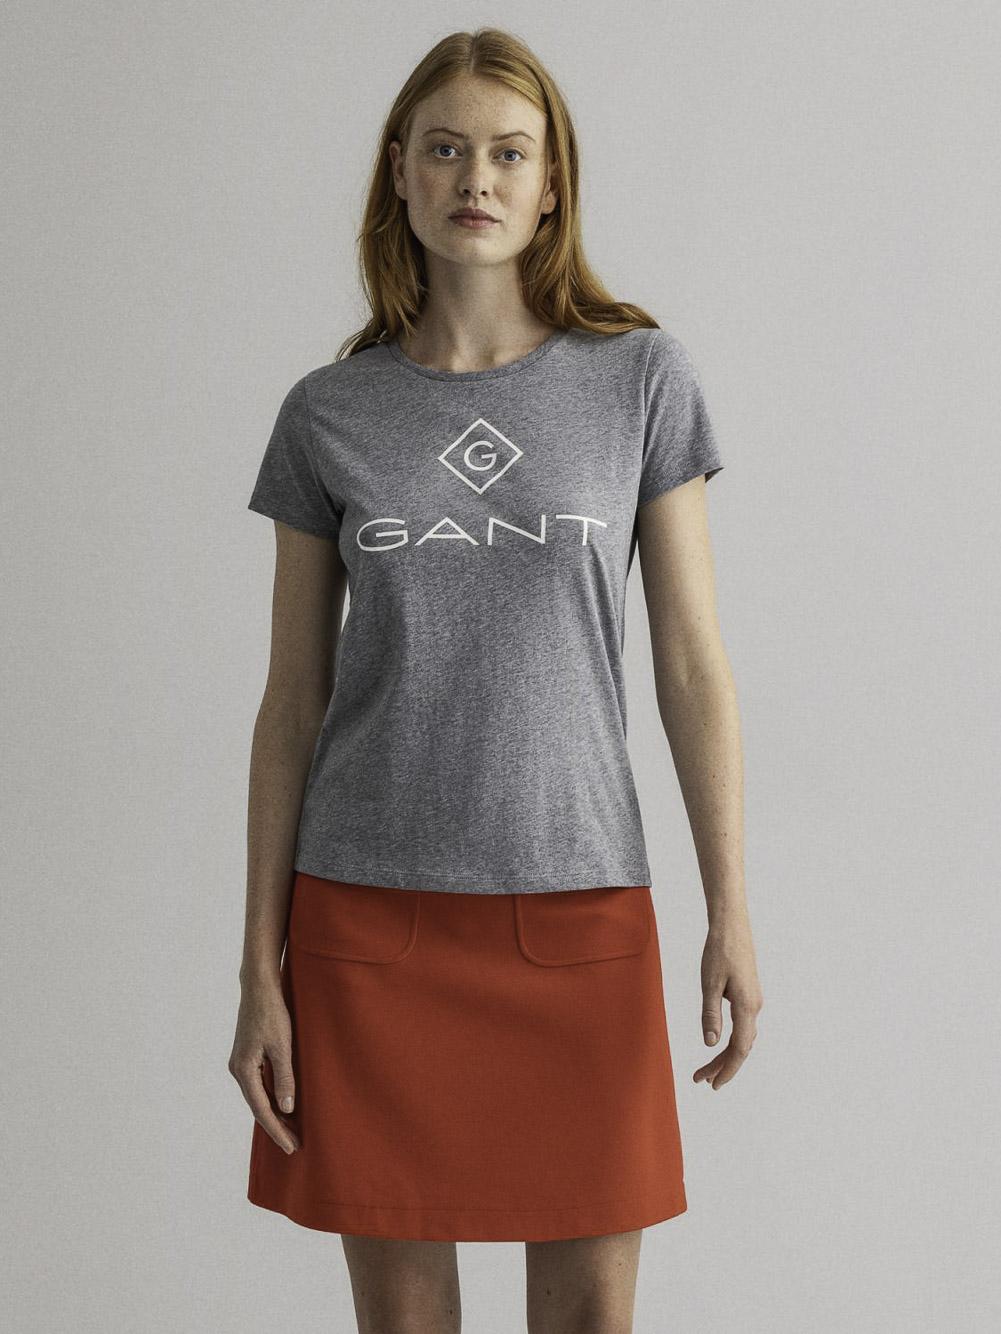 GANT Mπλούζα t-shirt 3GW4200396-93 ΓΚΡΙ